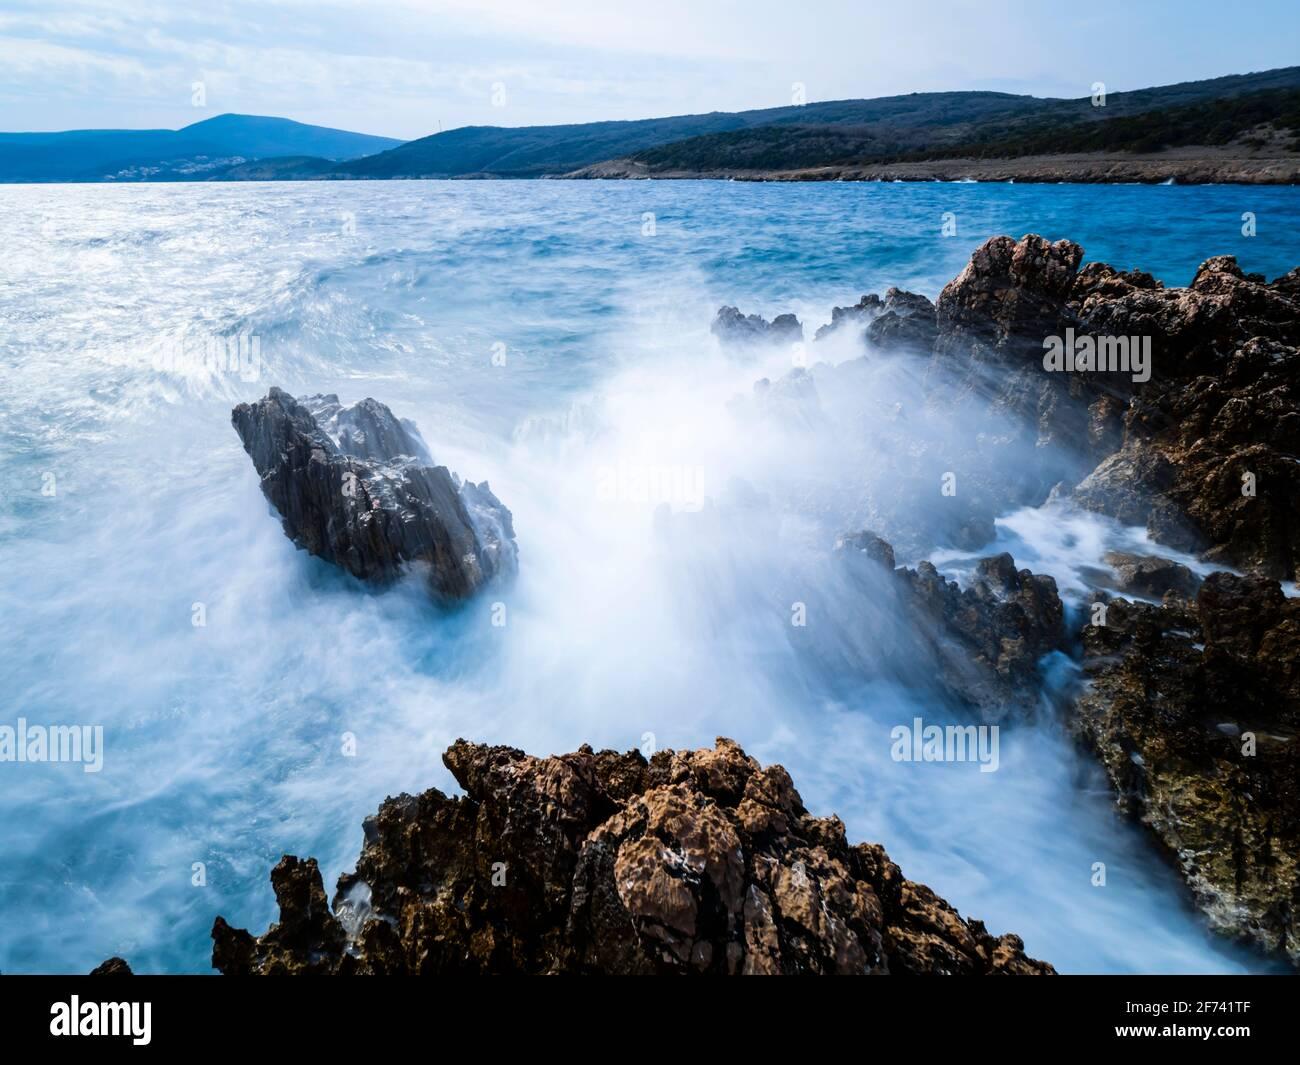 Severe weather high waves rough rocky rocks shore St Marak on Krk island in Croatia Europe long exposure Stock Photo